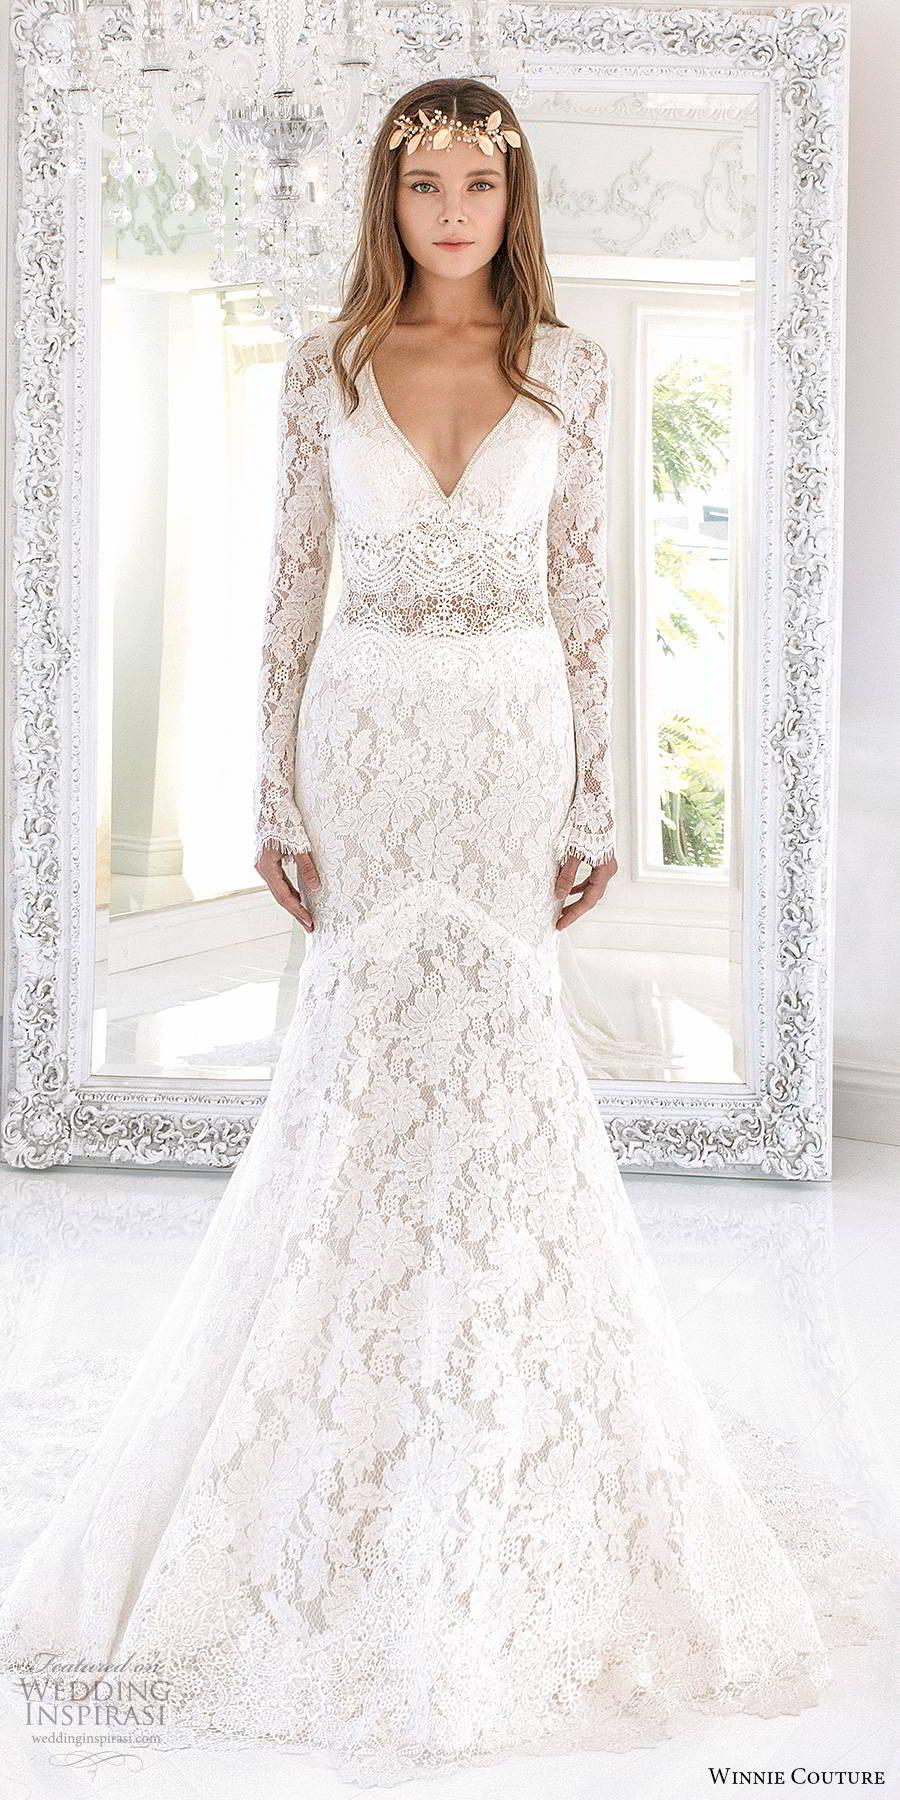 winnie couture 2019 bridal long sleeves deep v neckline fully embellished lace elegant boho fit flare mermaid wedding dress keyhole back (6) mv